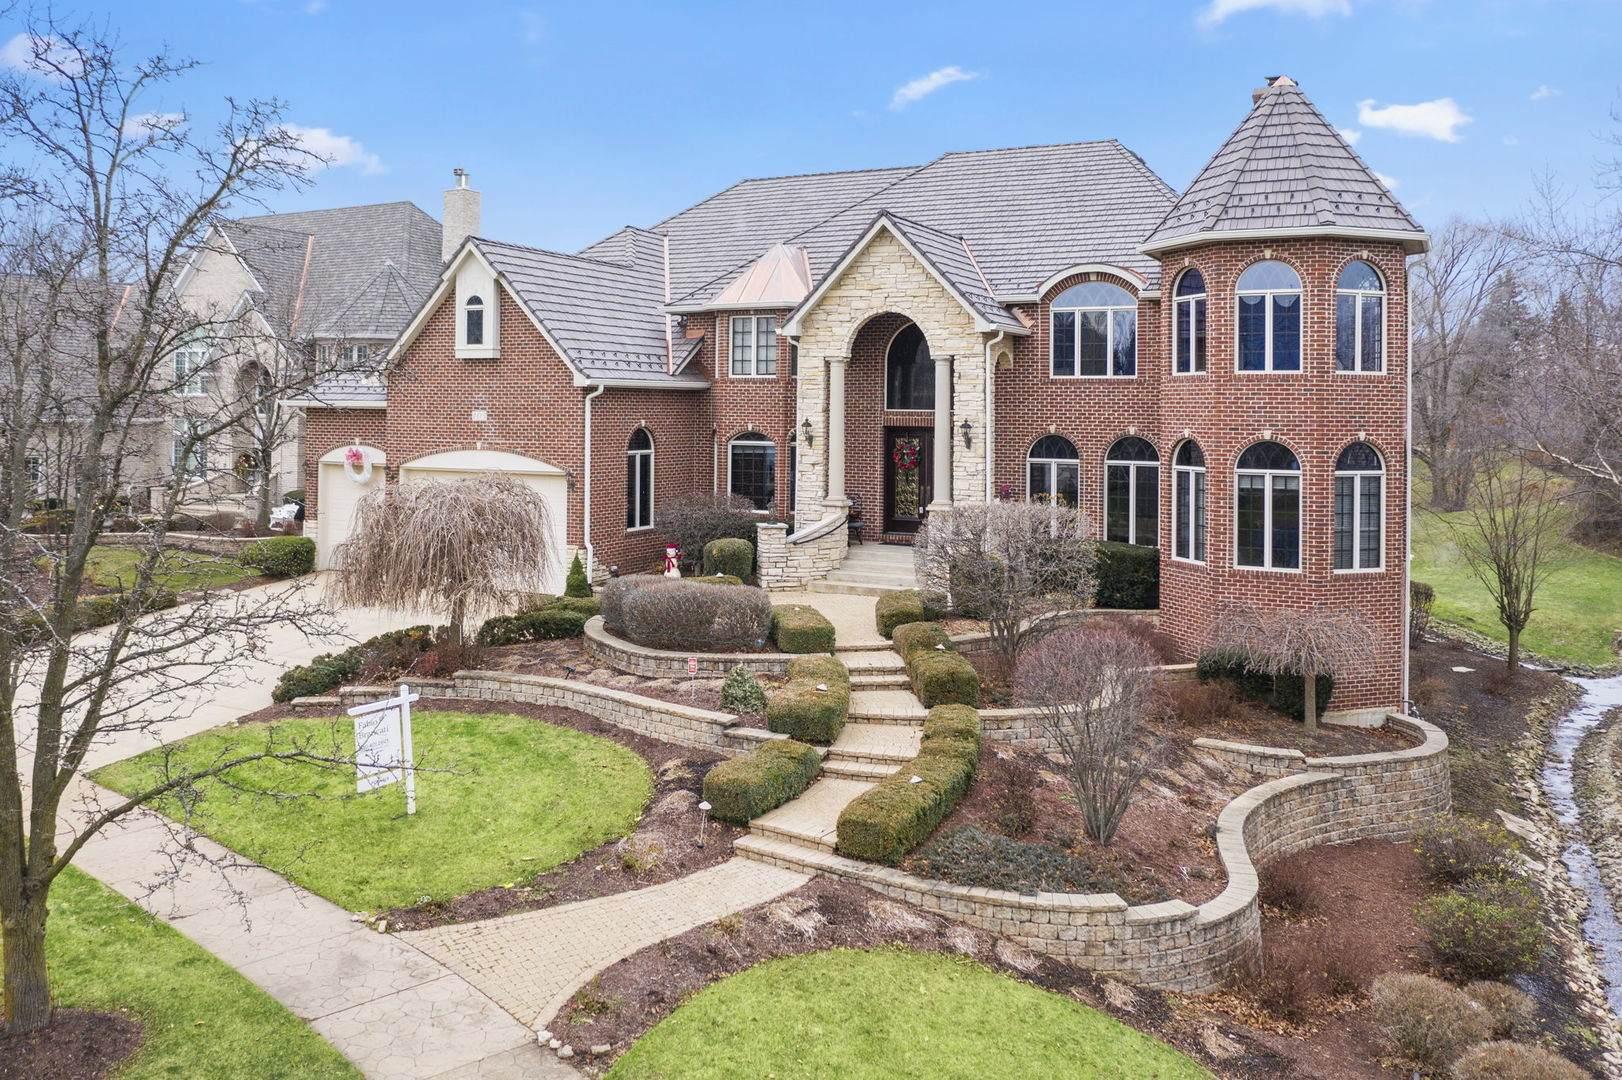 103 Settlers Drive, Naperville, IL 60565 (MLS #10737171) :: John Lyons Real Estate